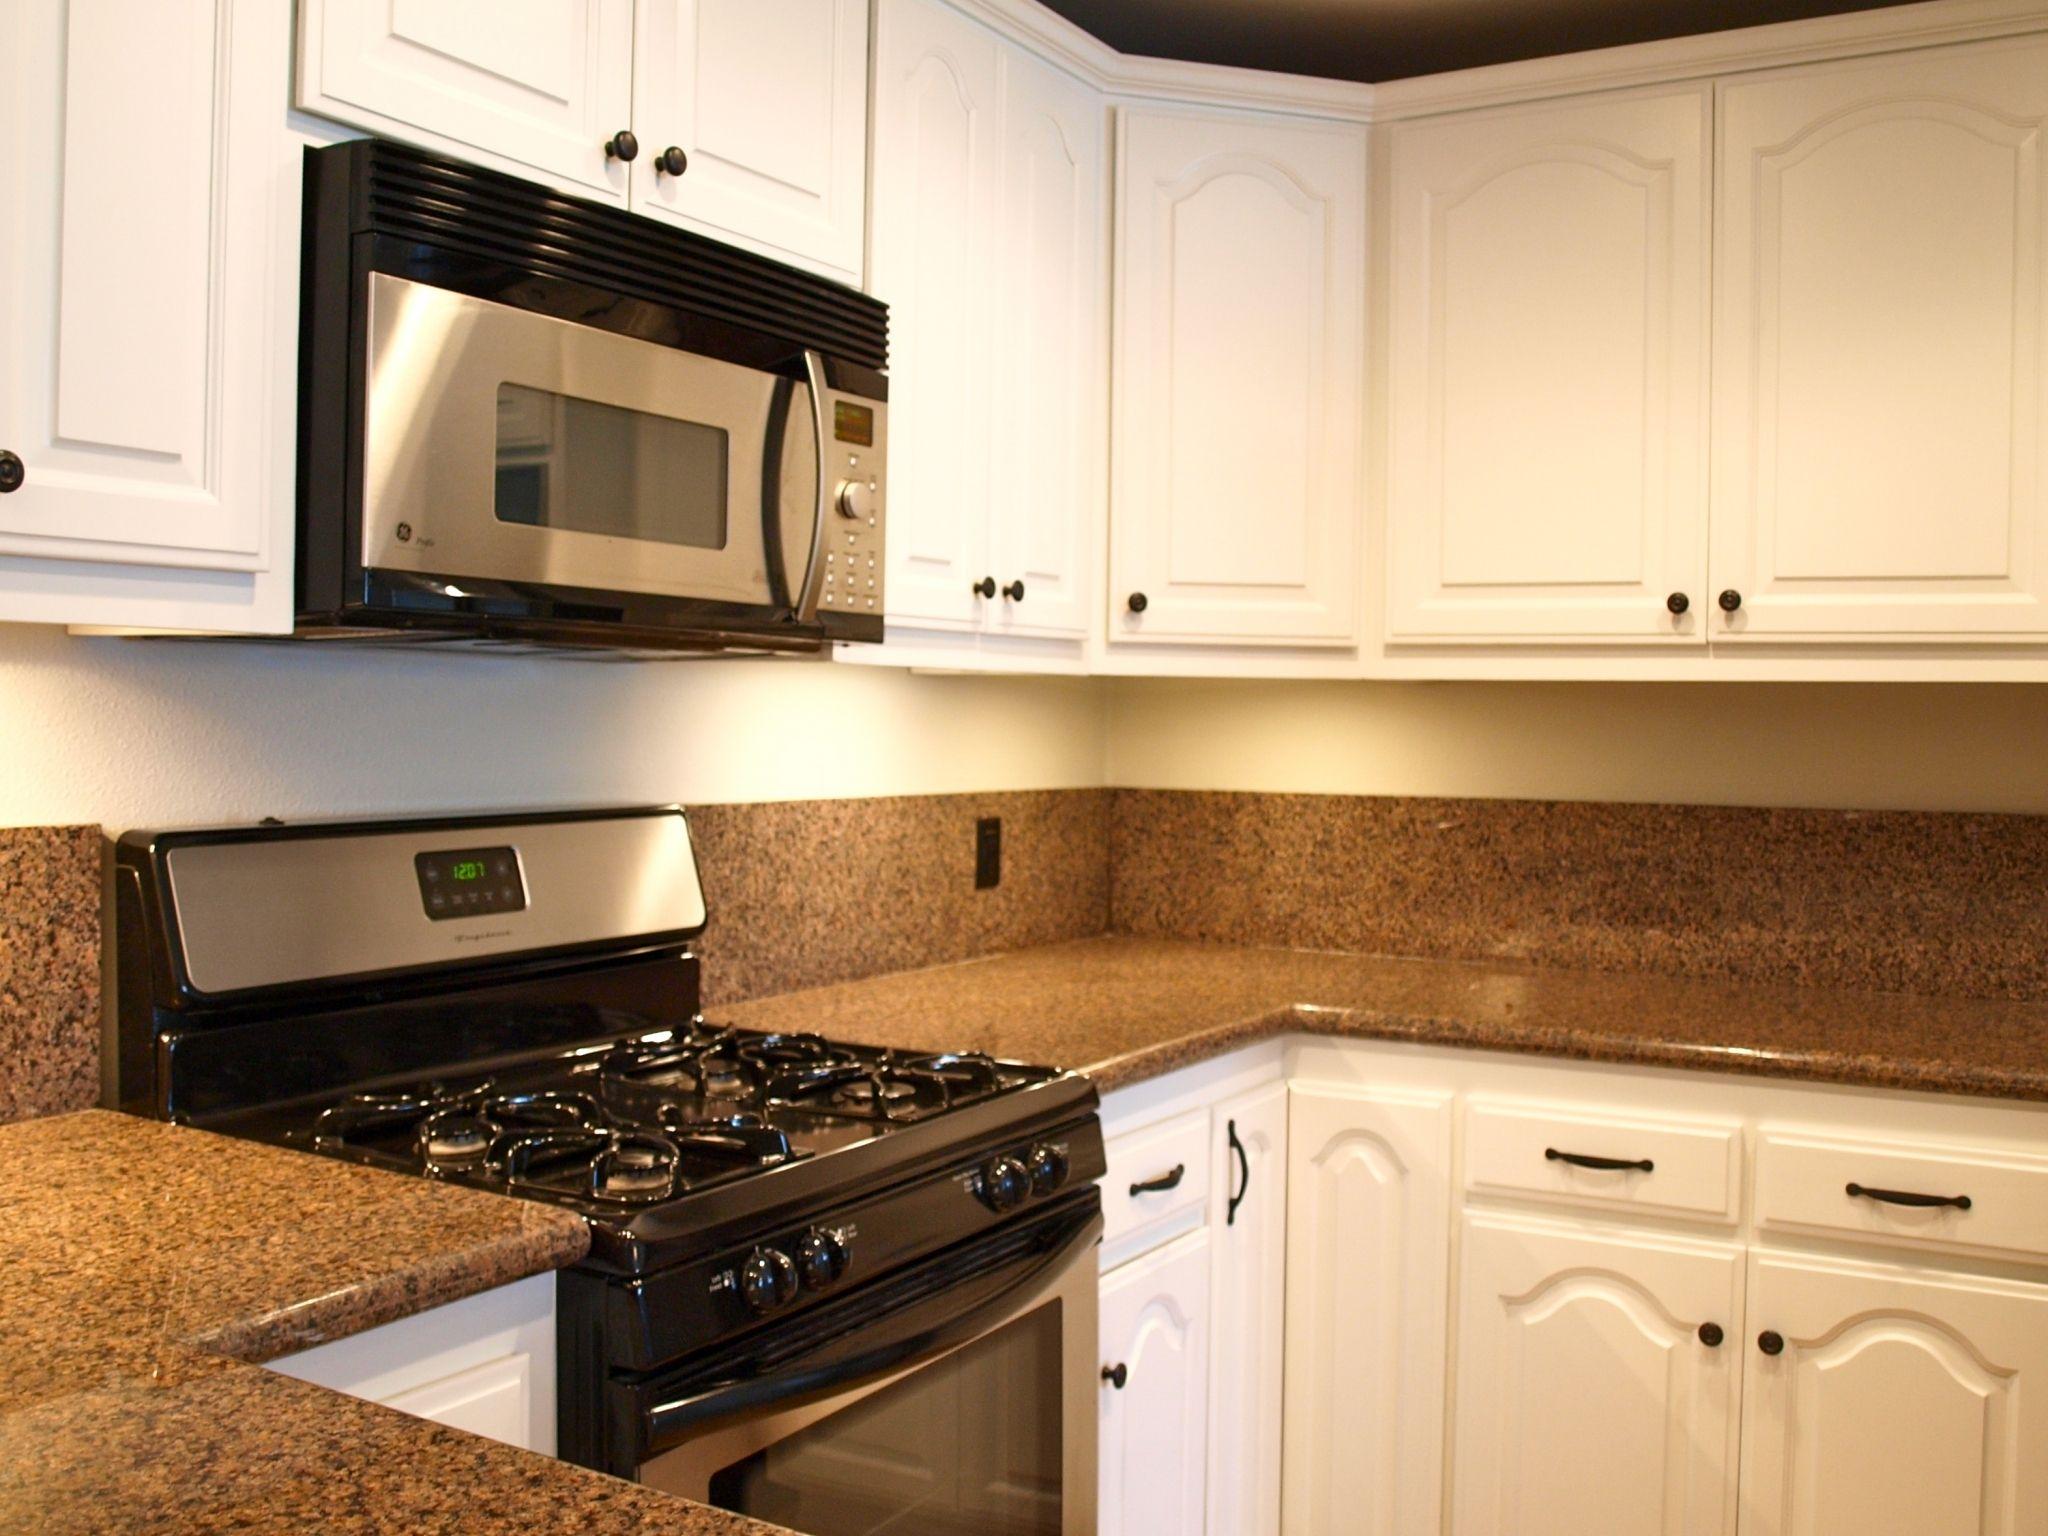 Oil Rubbed Bronze Kitchen Cabinet Handles  Kitchen Design Ideas For